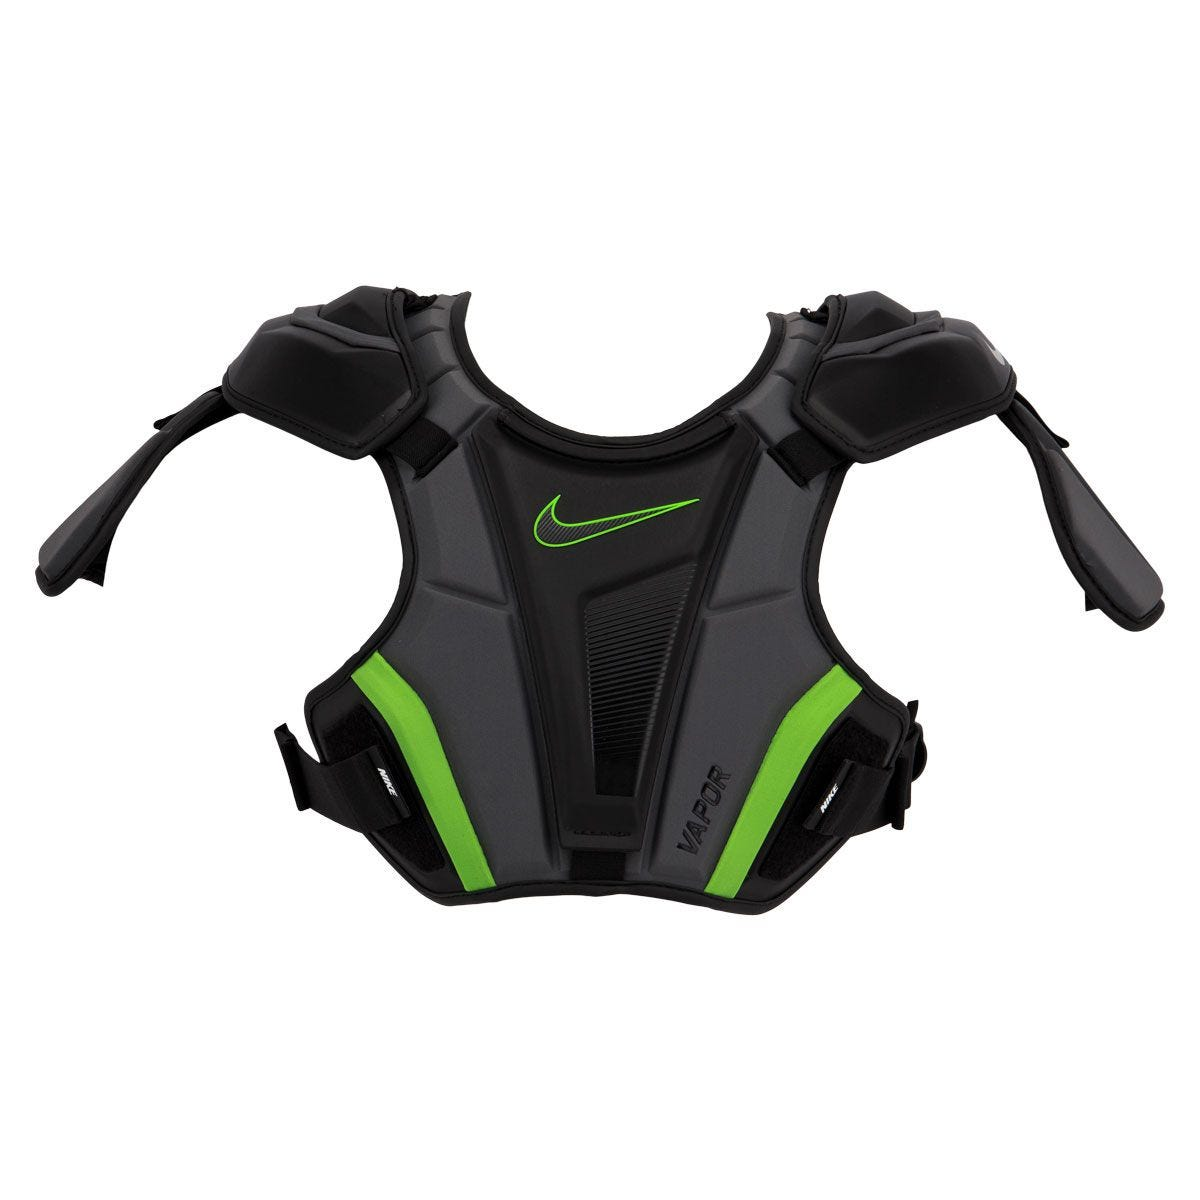 Nike Vapor 2.0 - Lightweight and Ergonomic